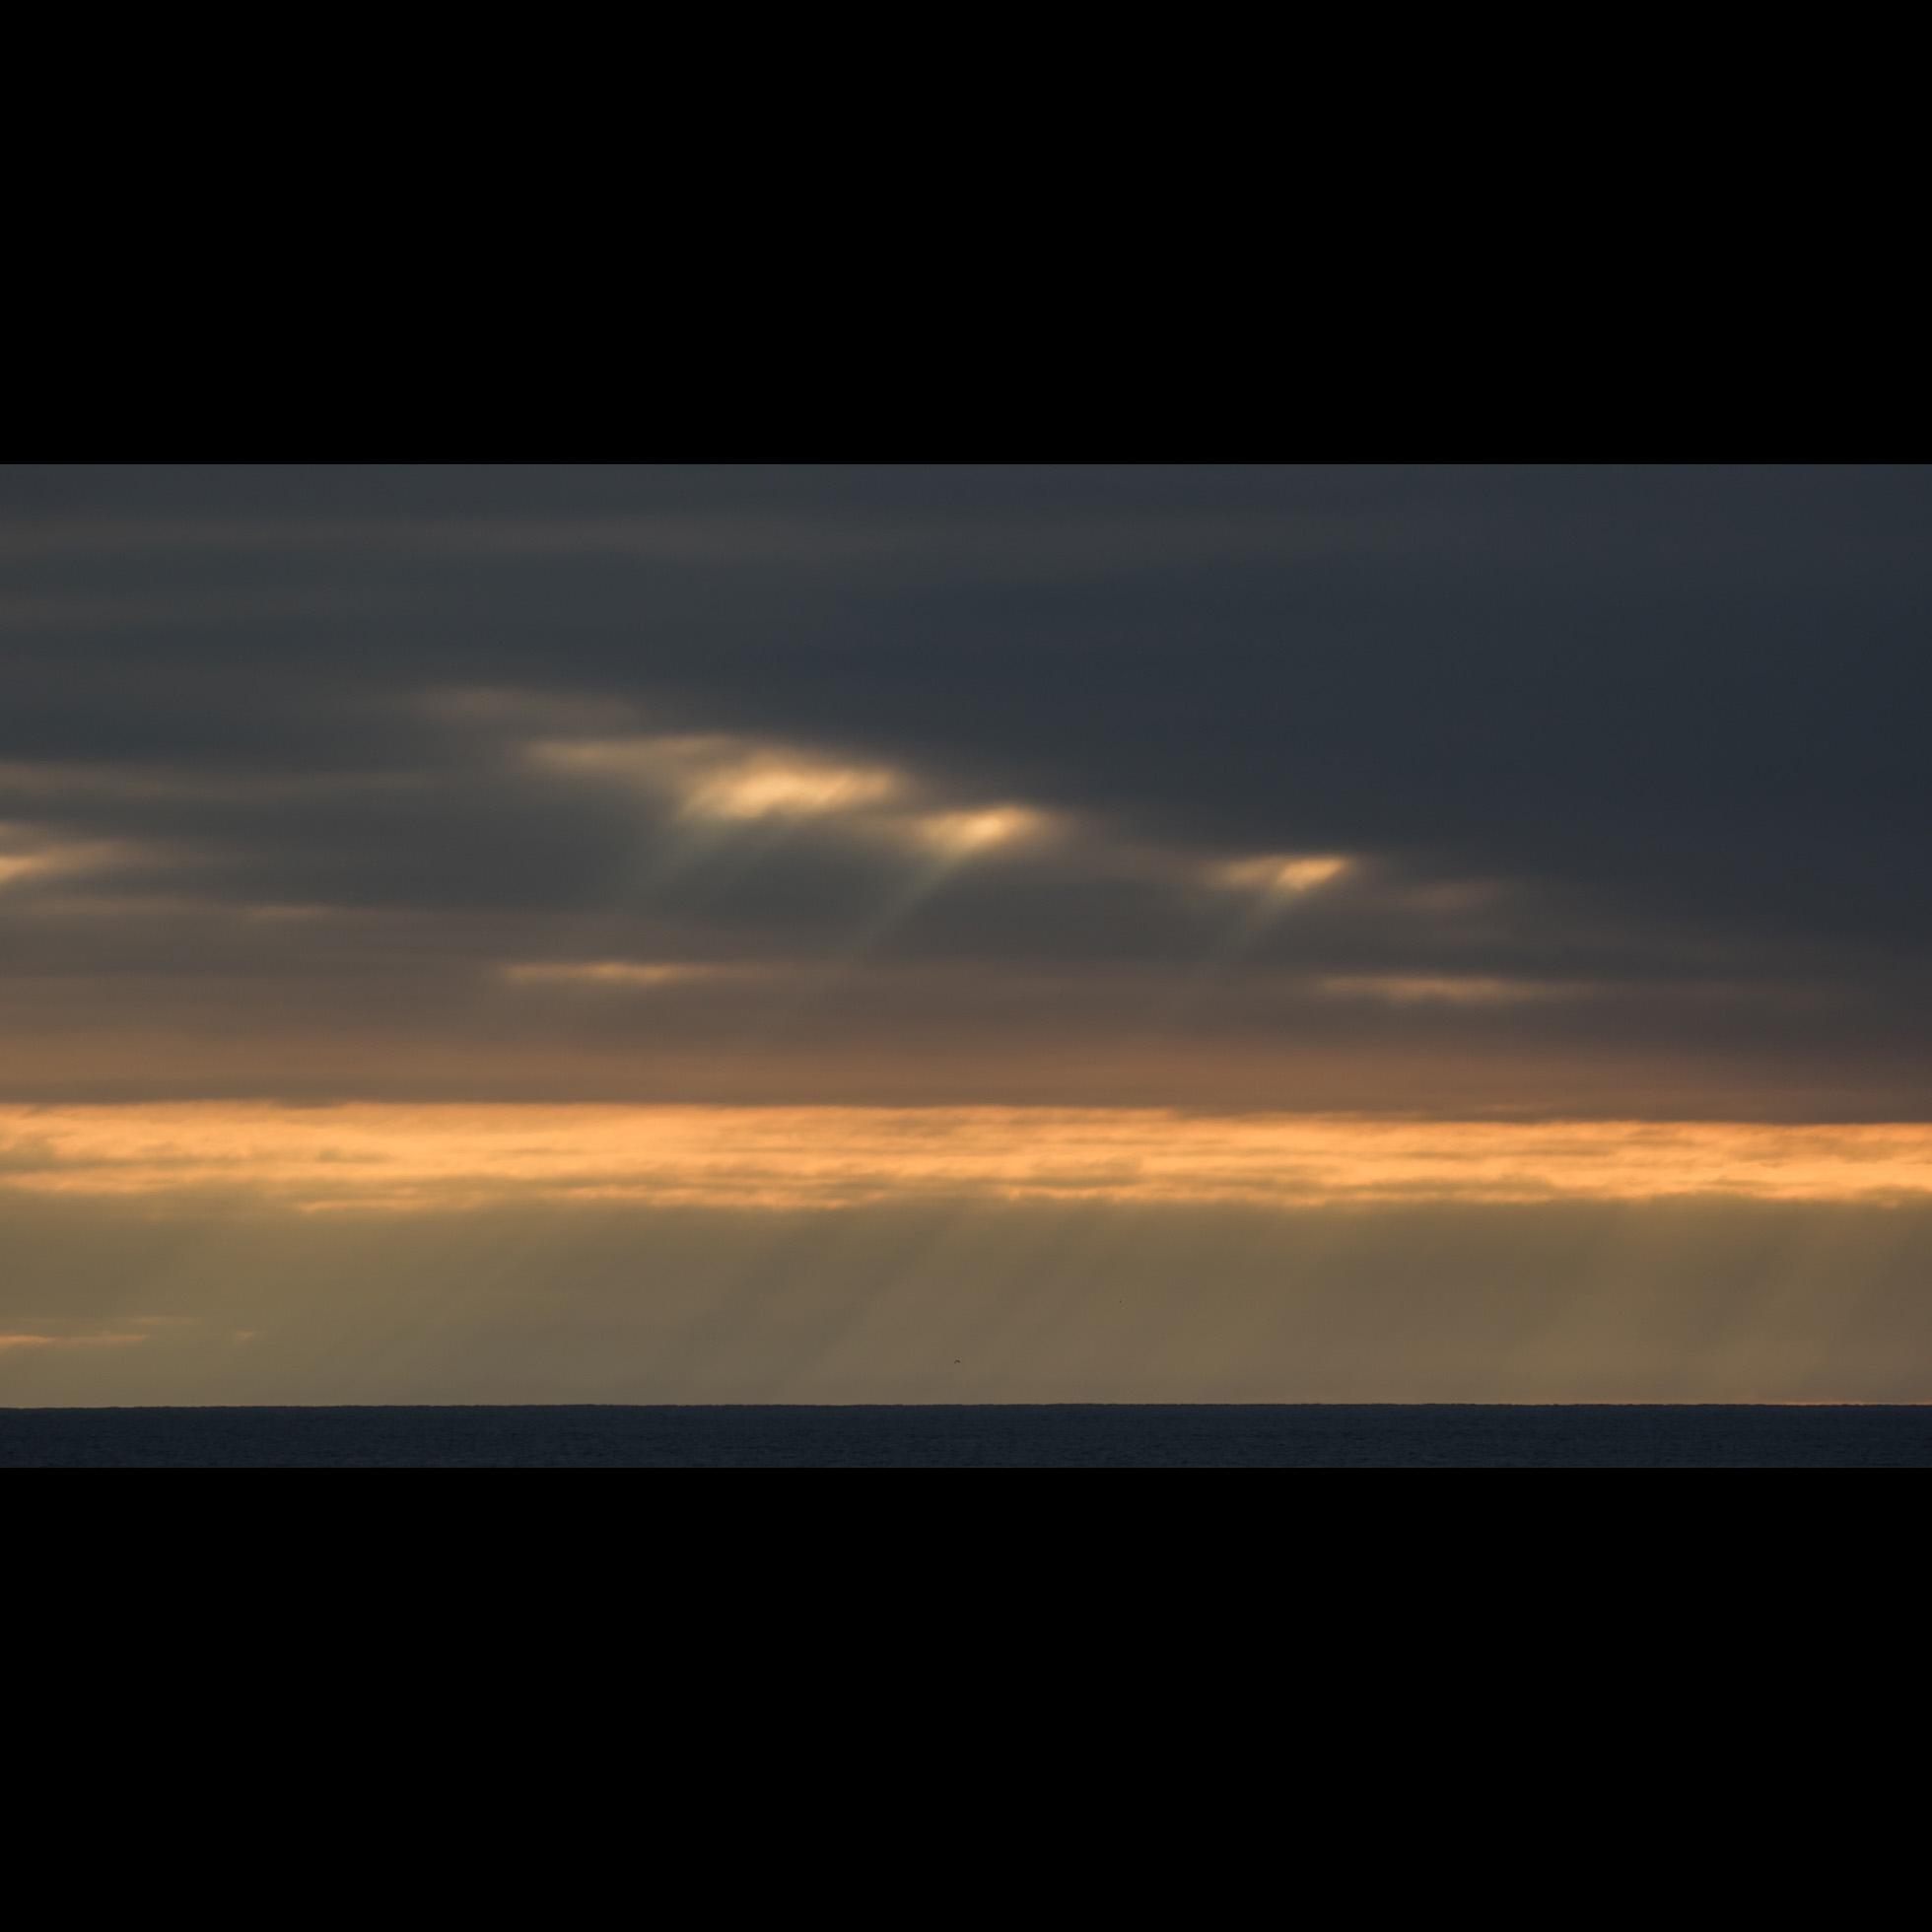 1.19 SOUTH BEACH LIGHT